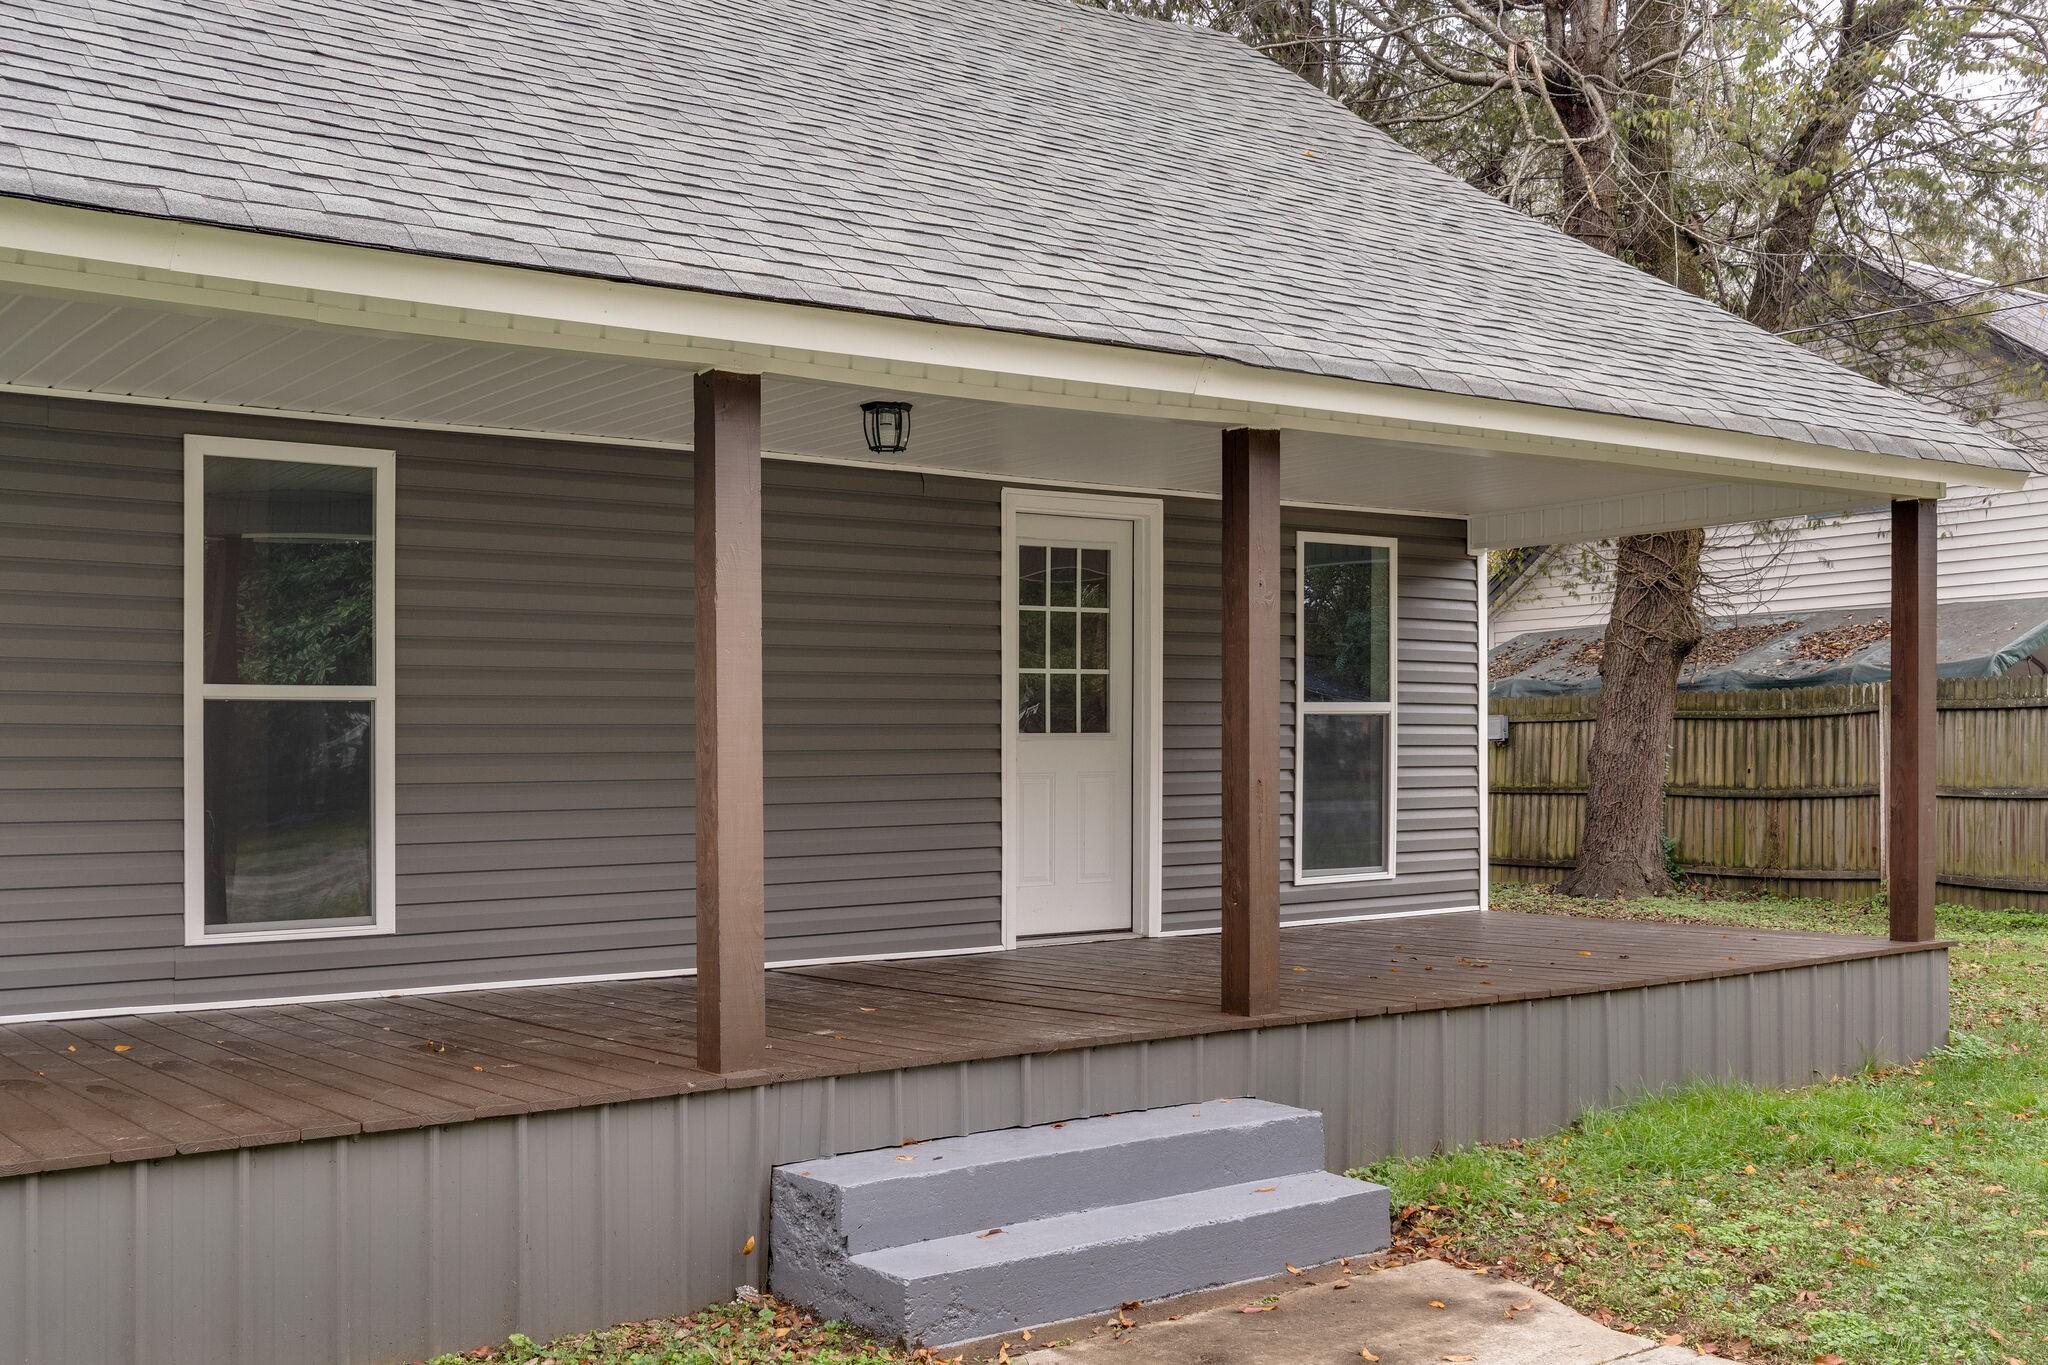 307 Washington Ave Property Photo - Mount Pleasant, TN real estate listing